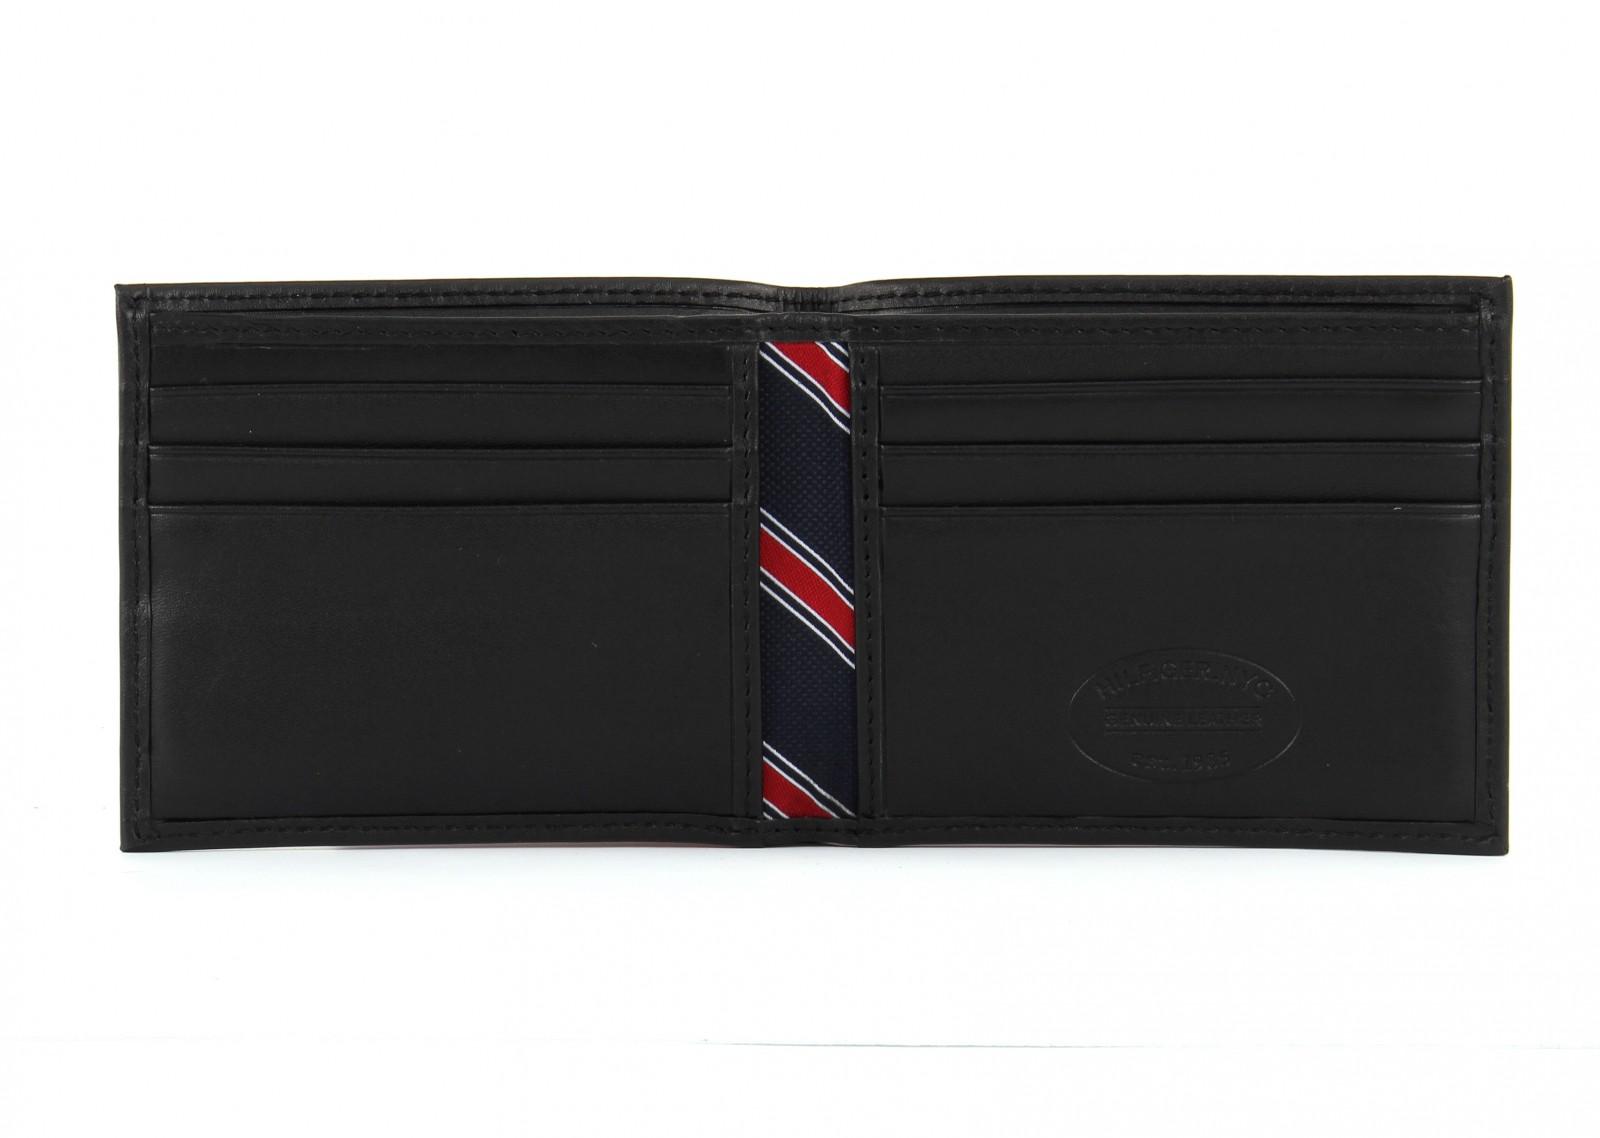 tommy hilfiger eton mini cc wallet gift box geldb rse. Black Bedroom Furniture Sets. Home Design Ideas